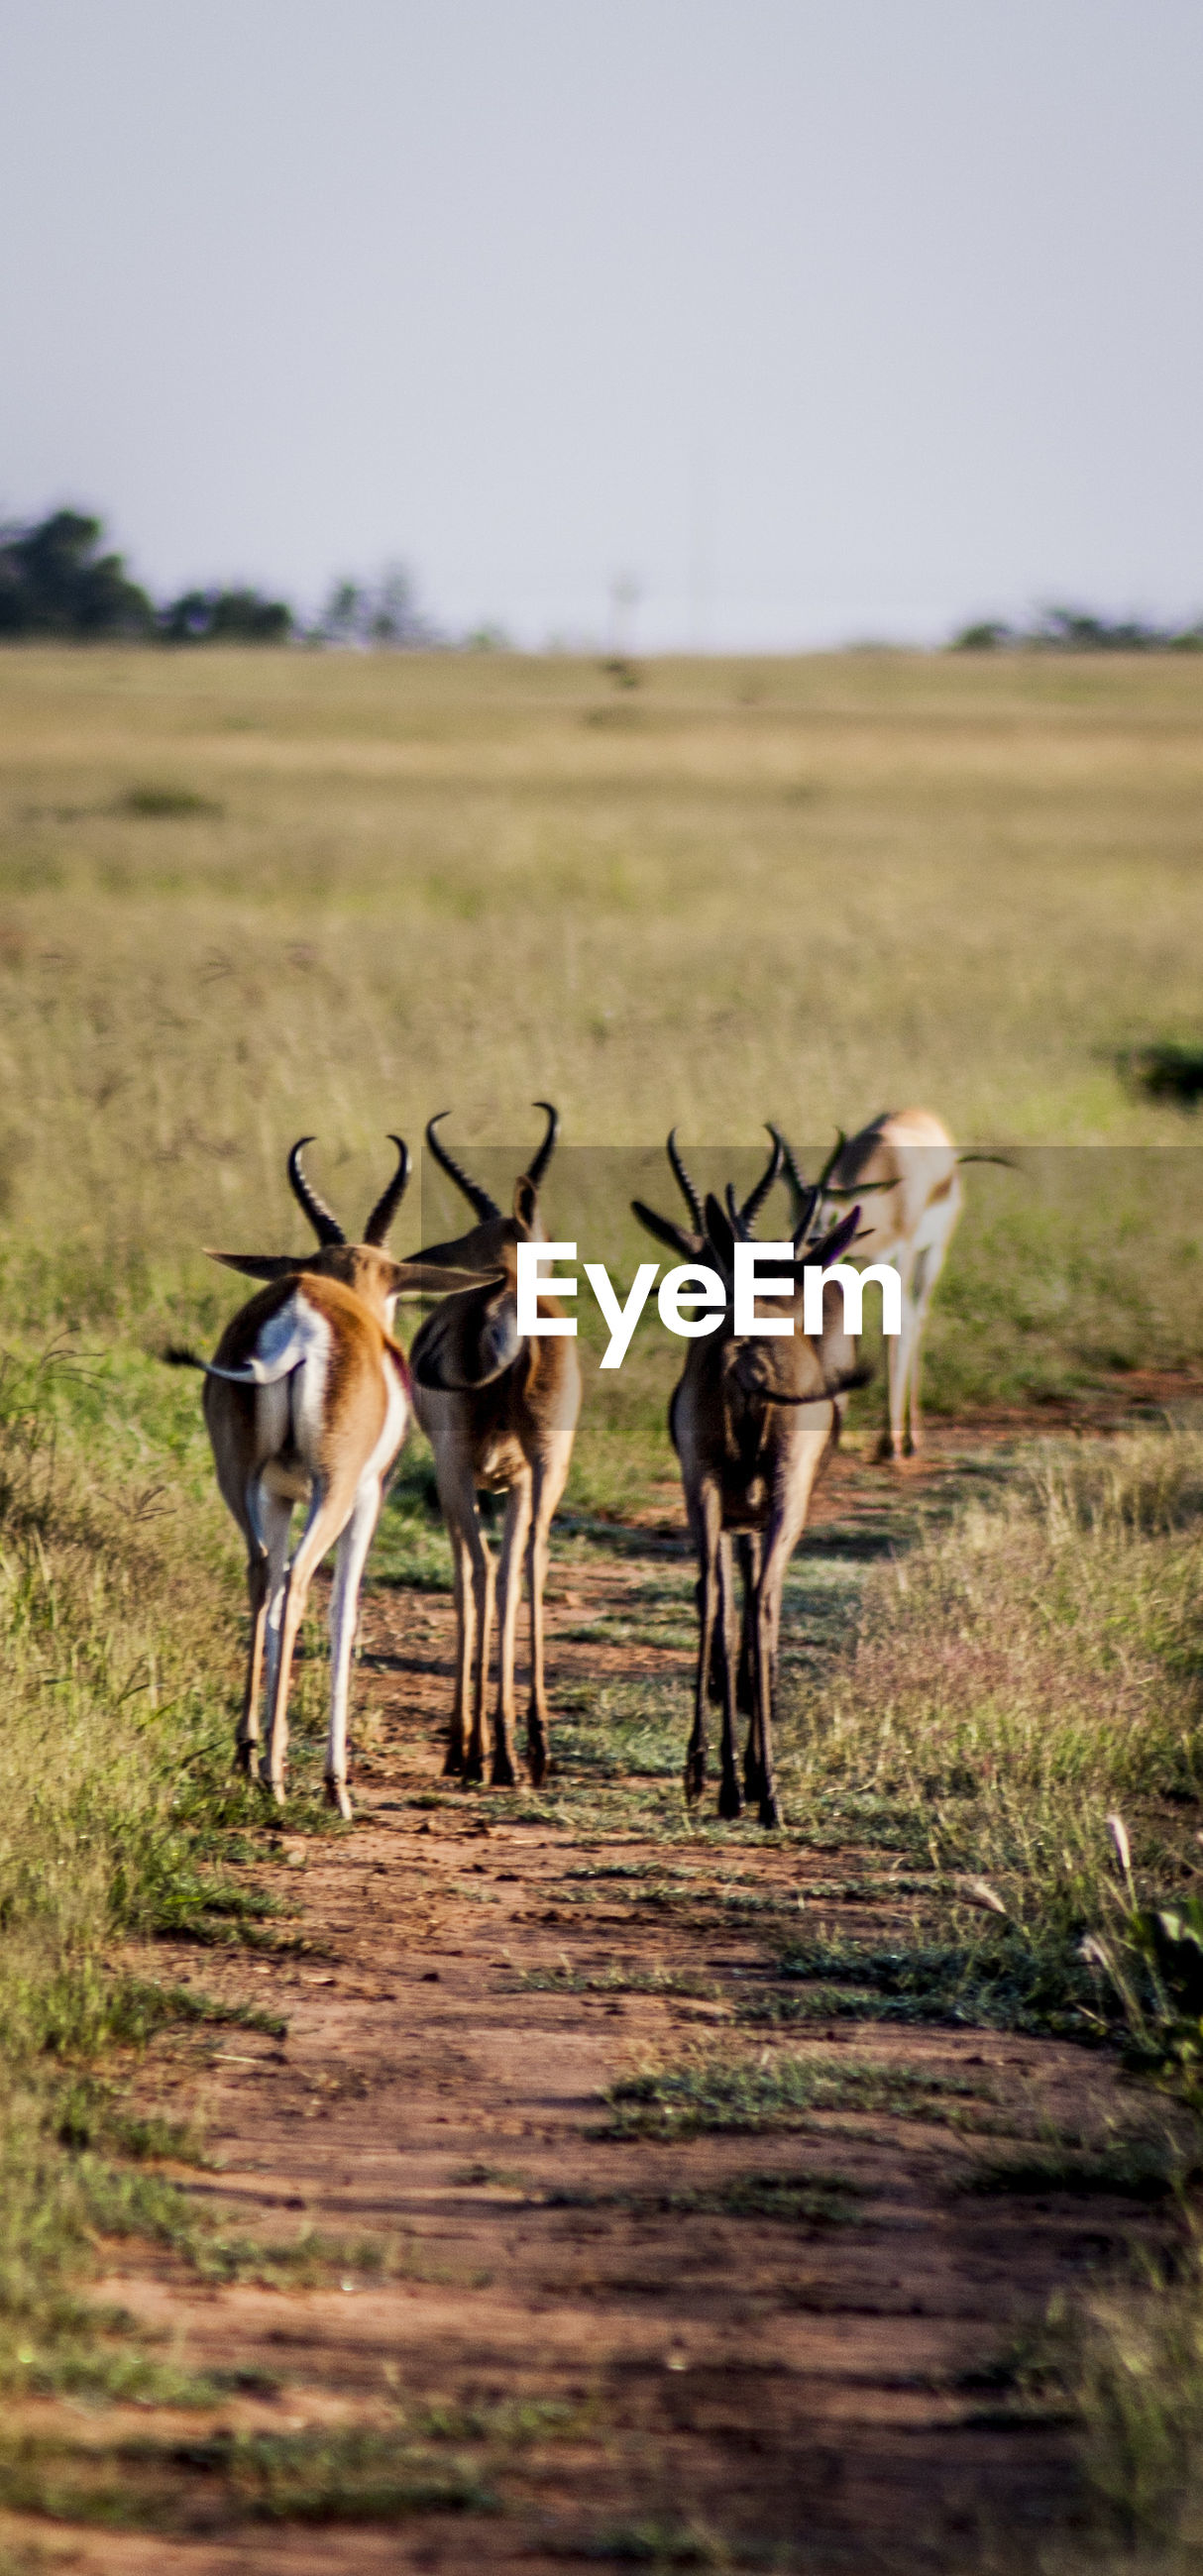 Animals walking on field